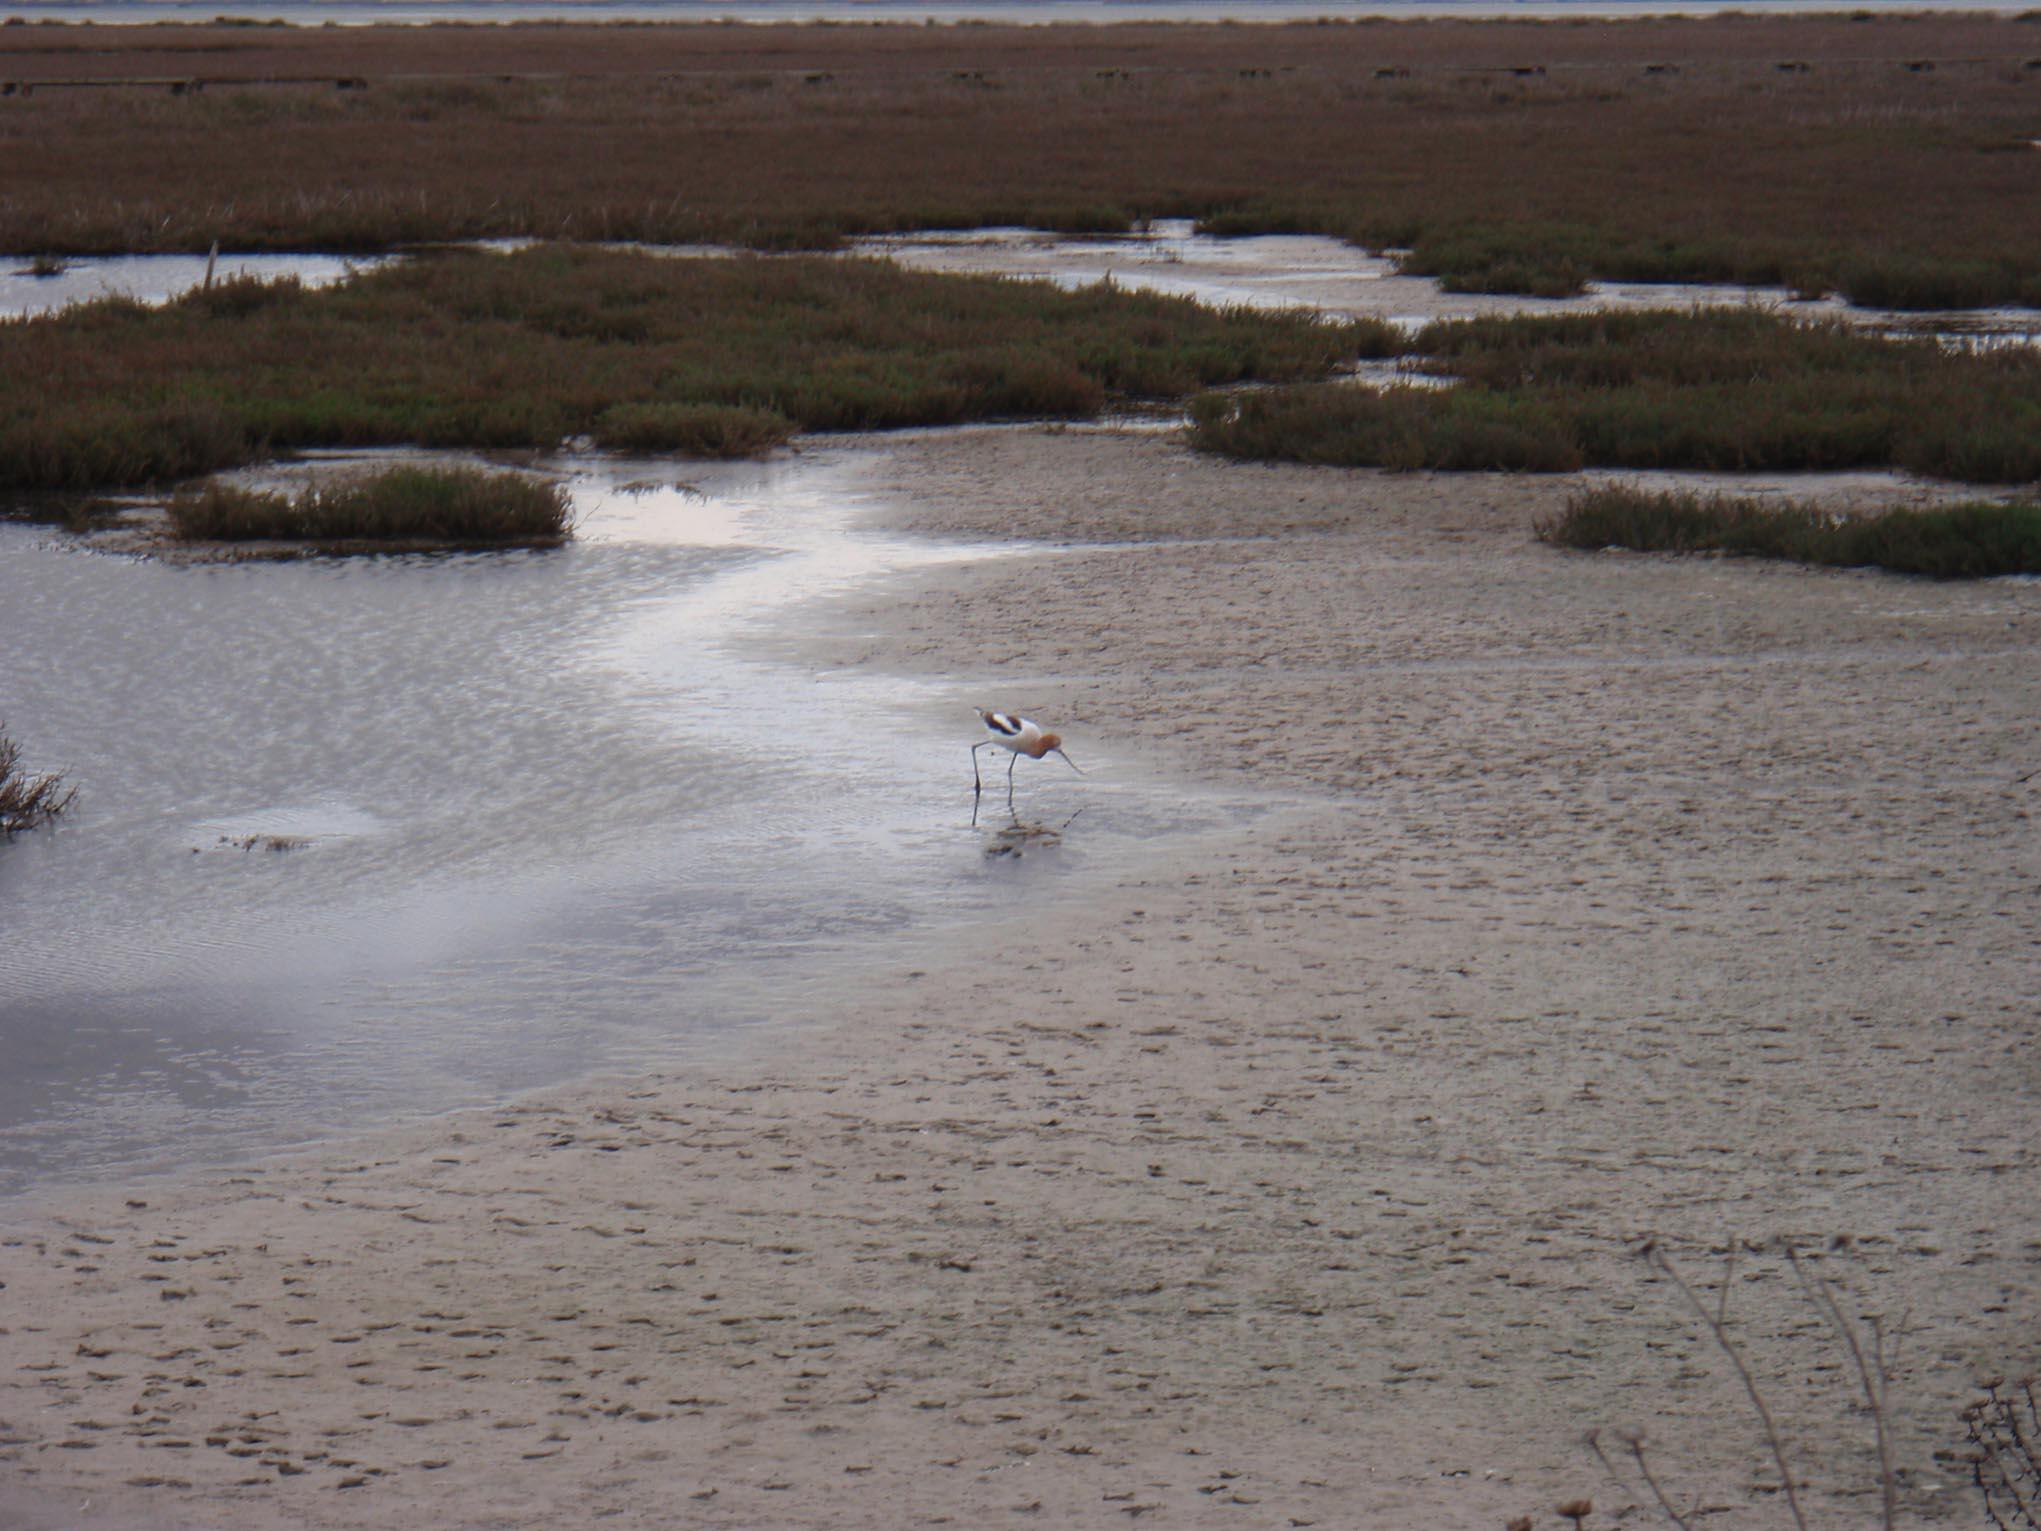 Heron, Palo Alto Baylands, March 2009